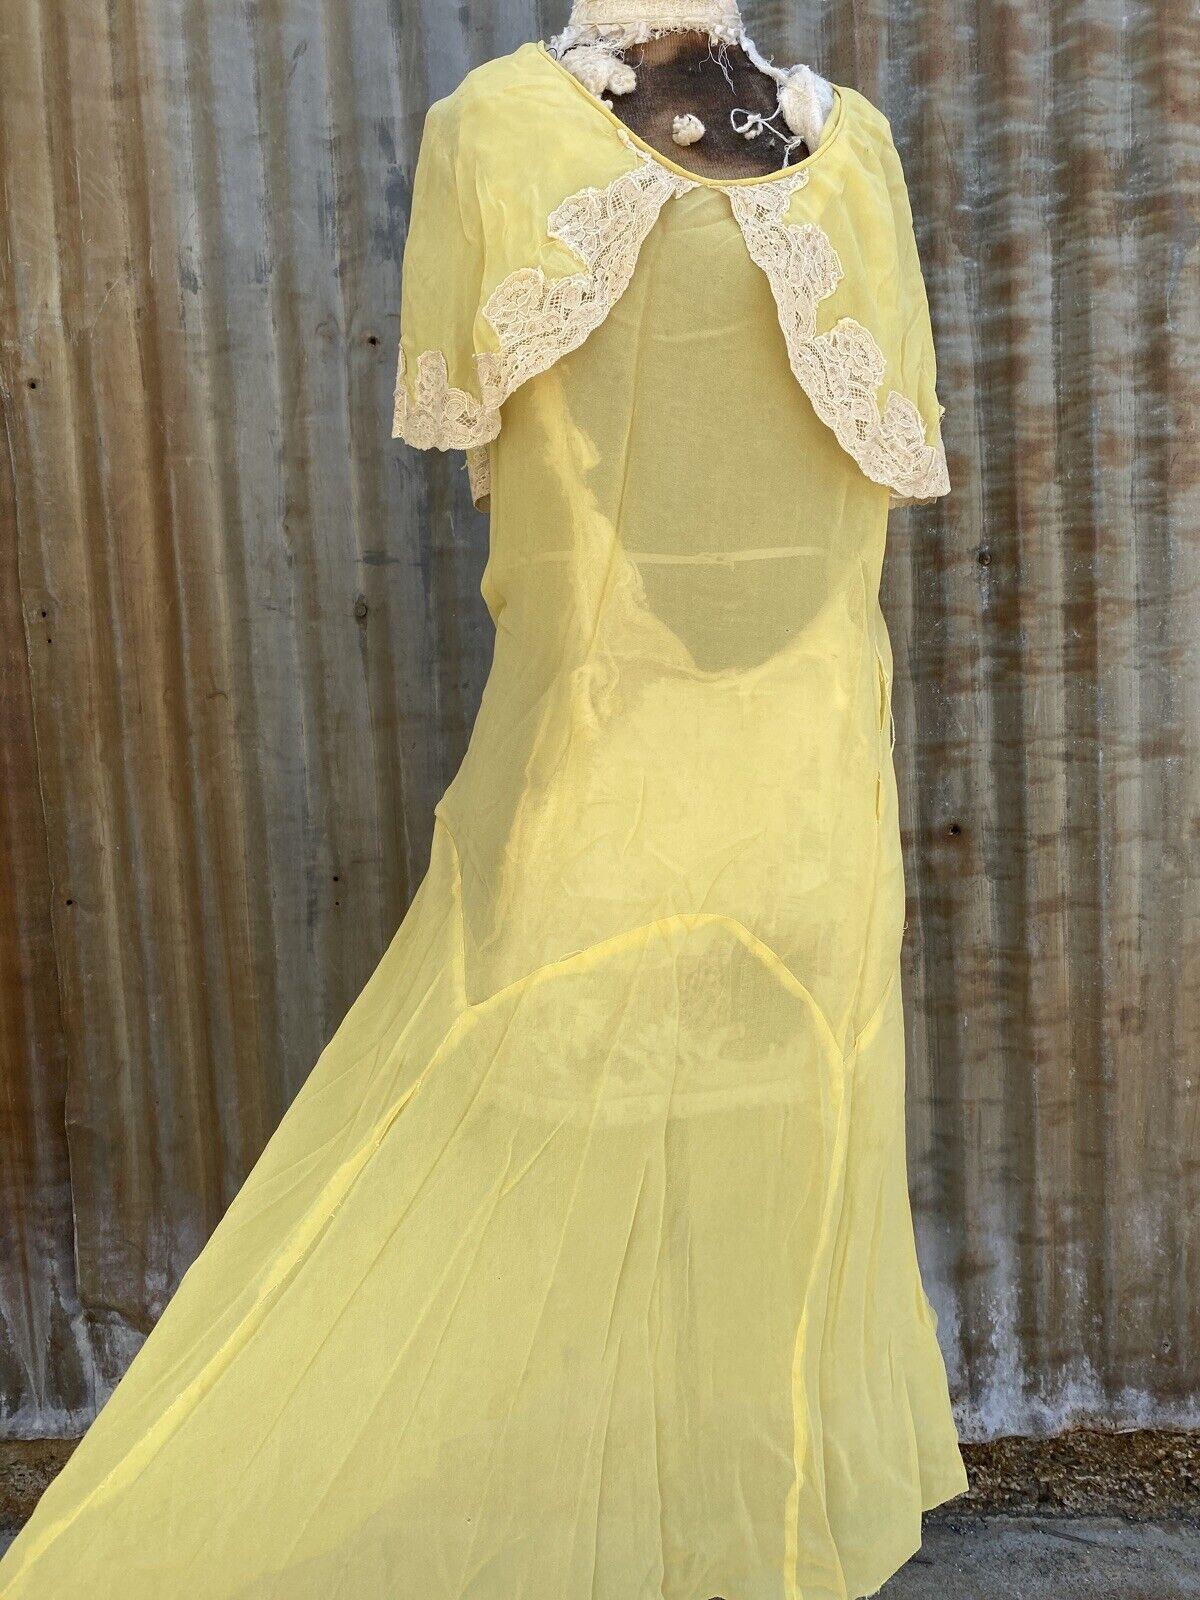 Antique 1920s 1930s Yellow Silk Chiffon Midi Dres… - image 3